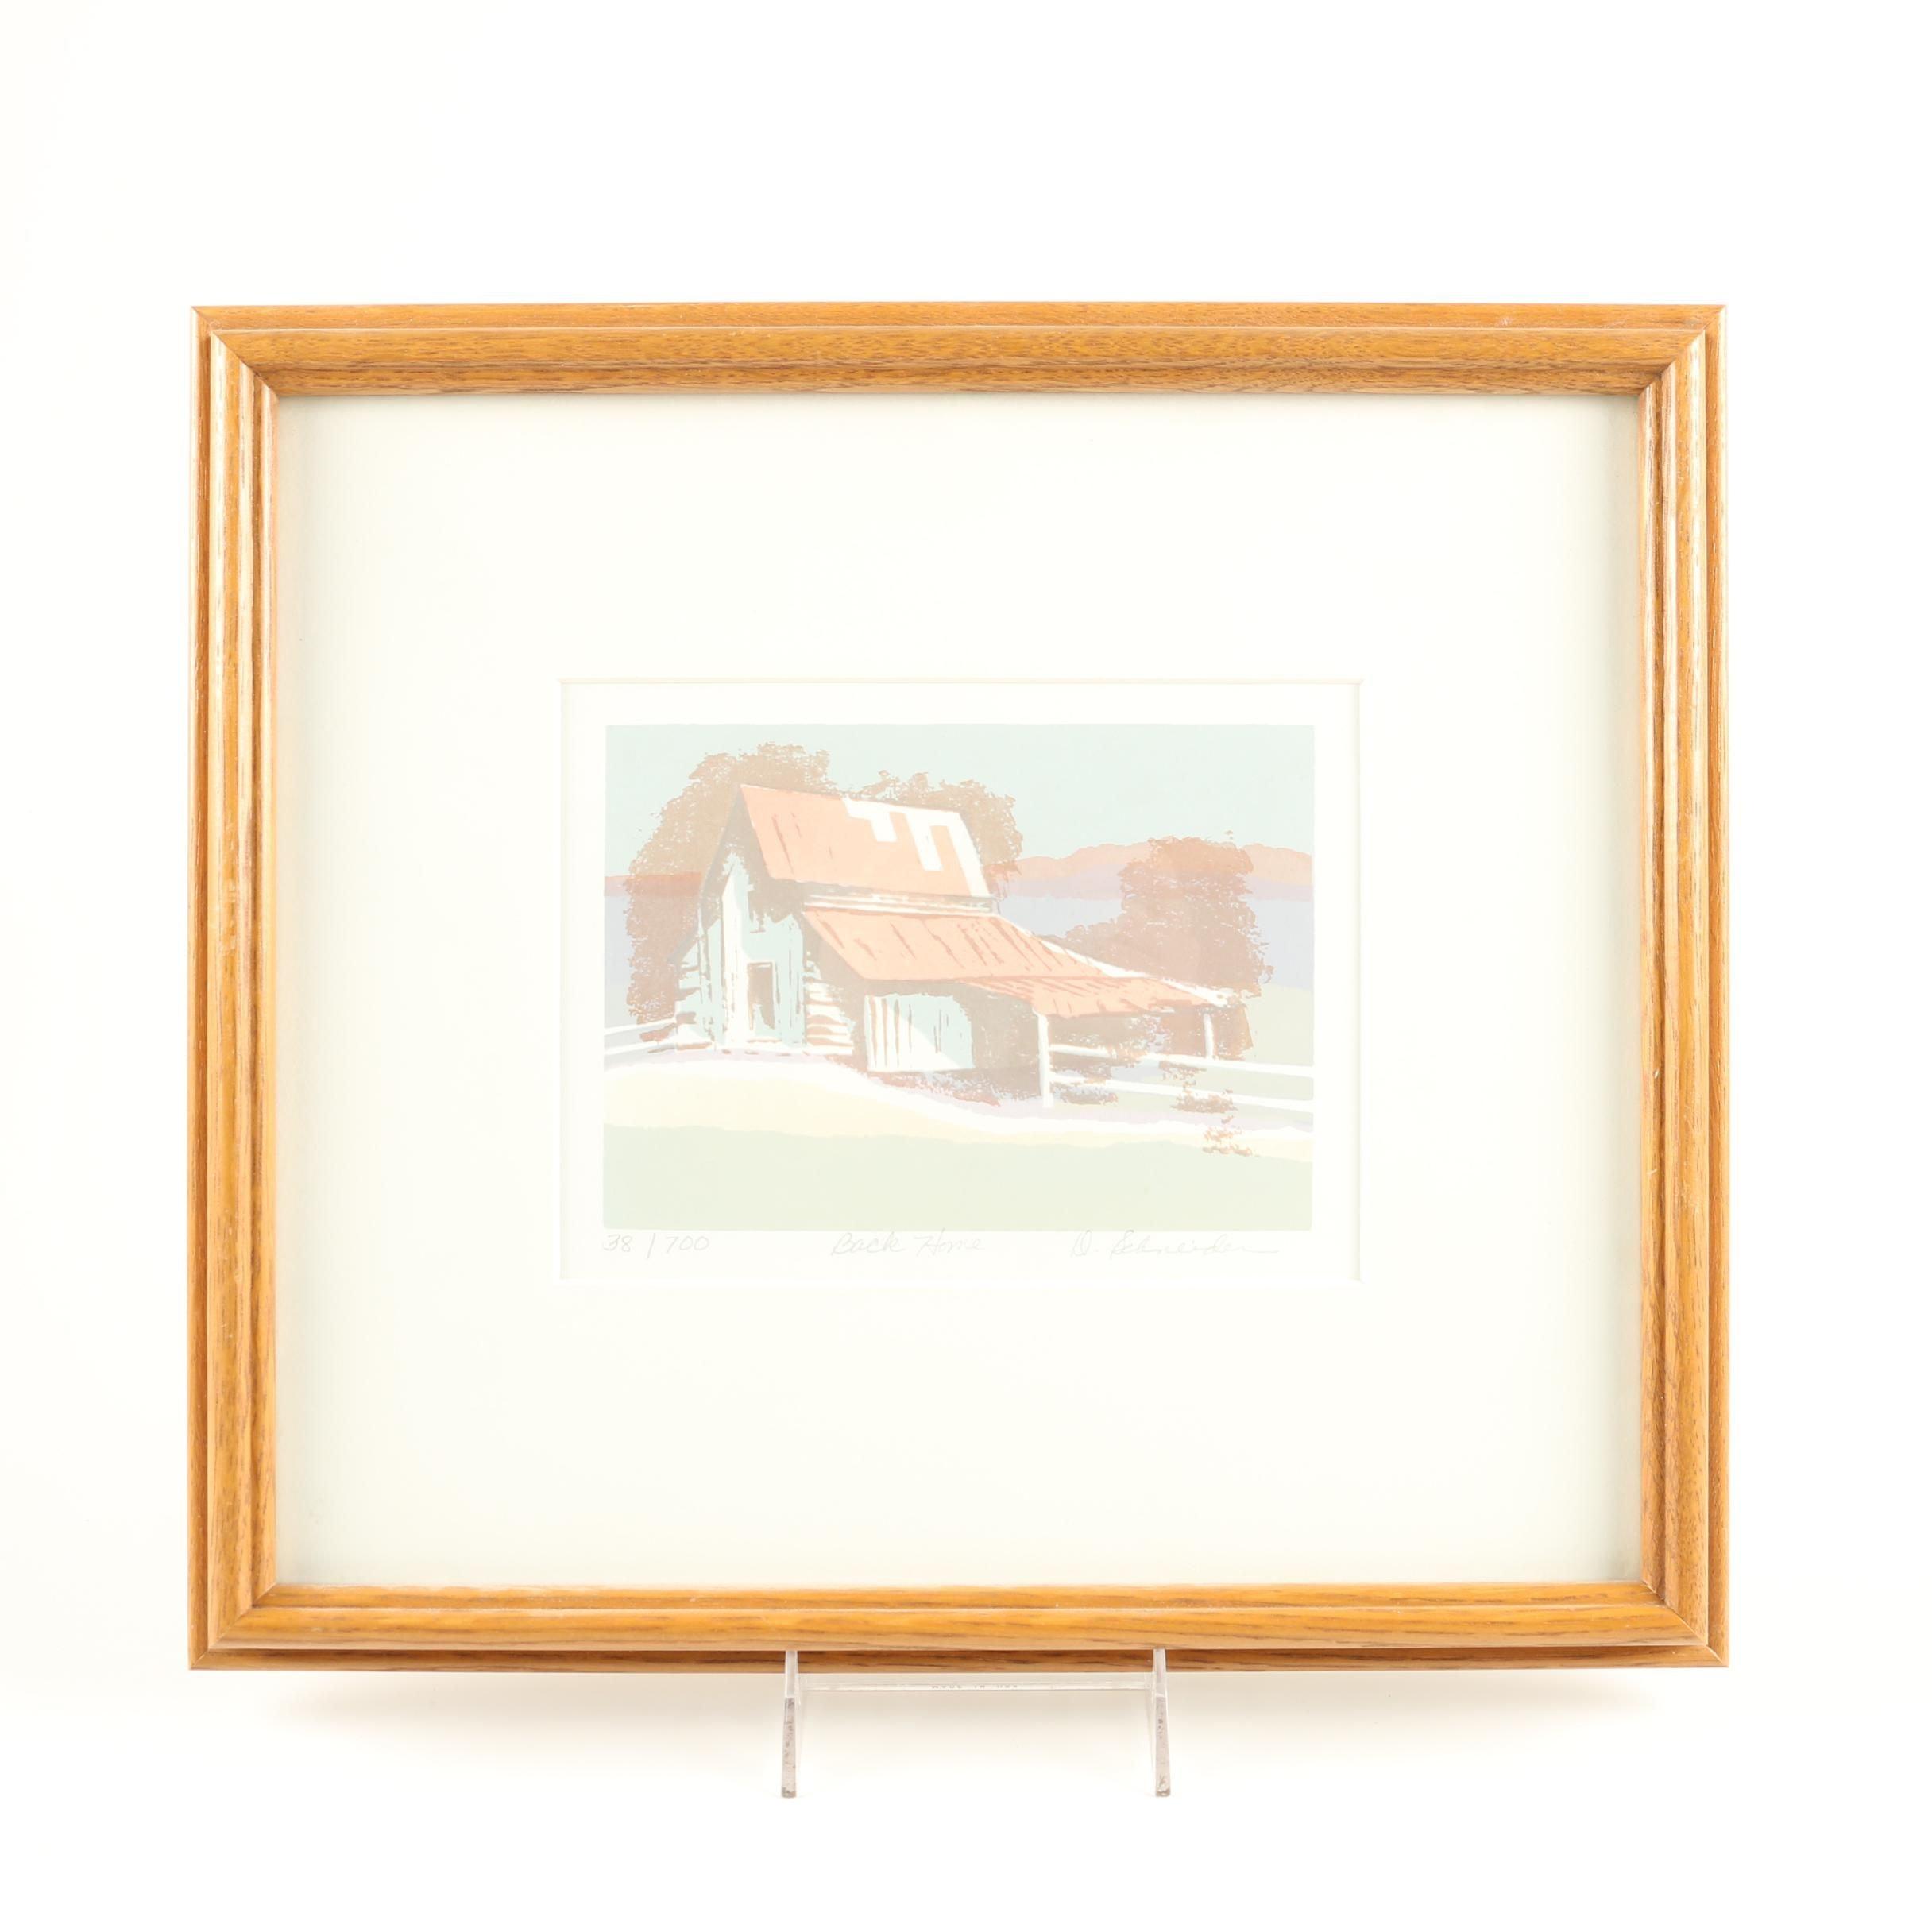 "D. Shneider Limited Edition Serigraph on Paper ""Back Home"""